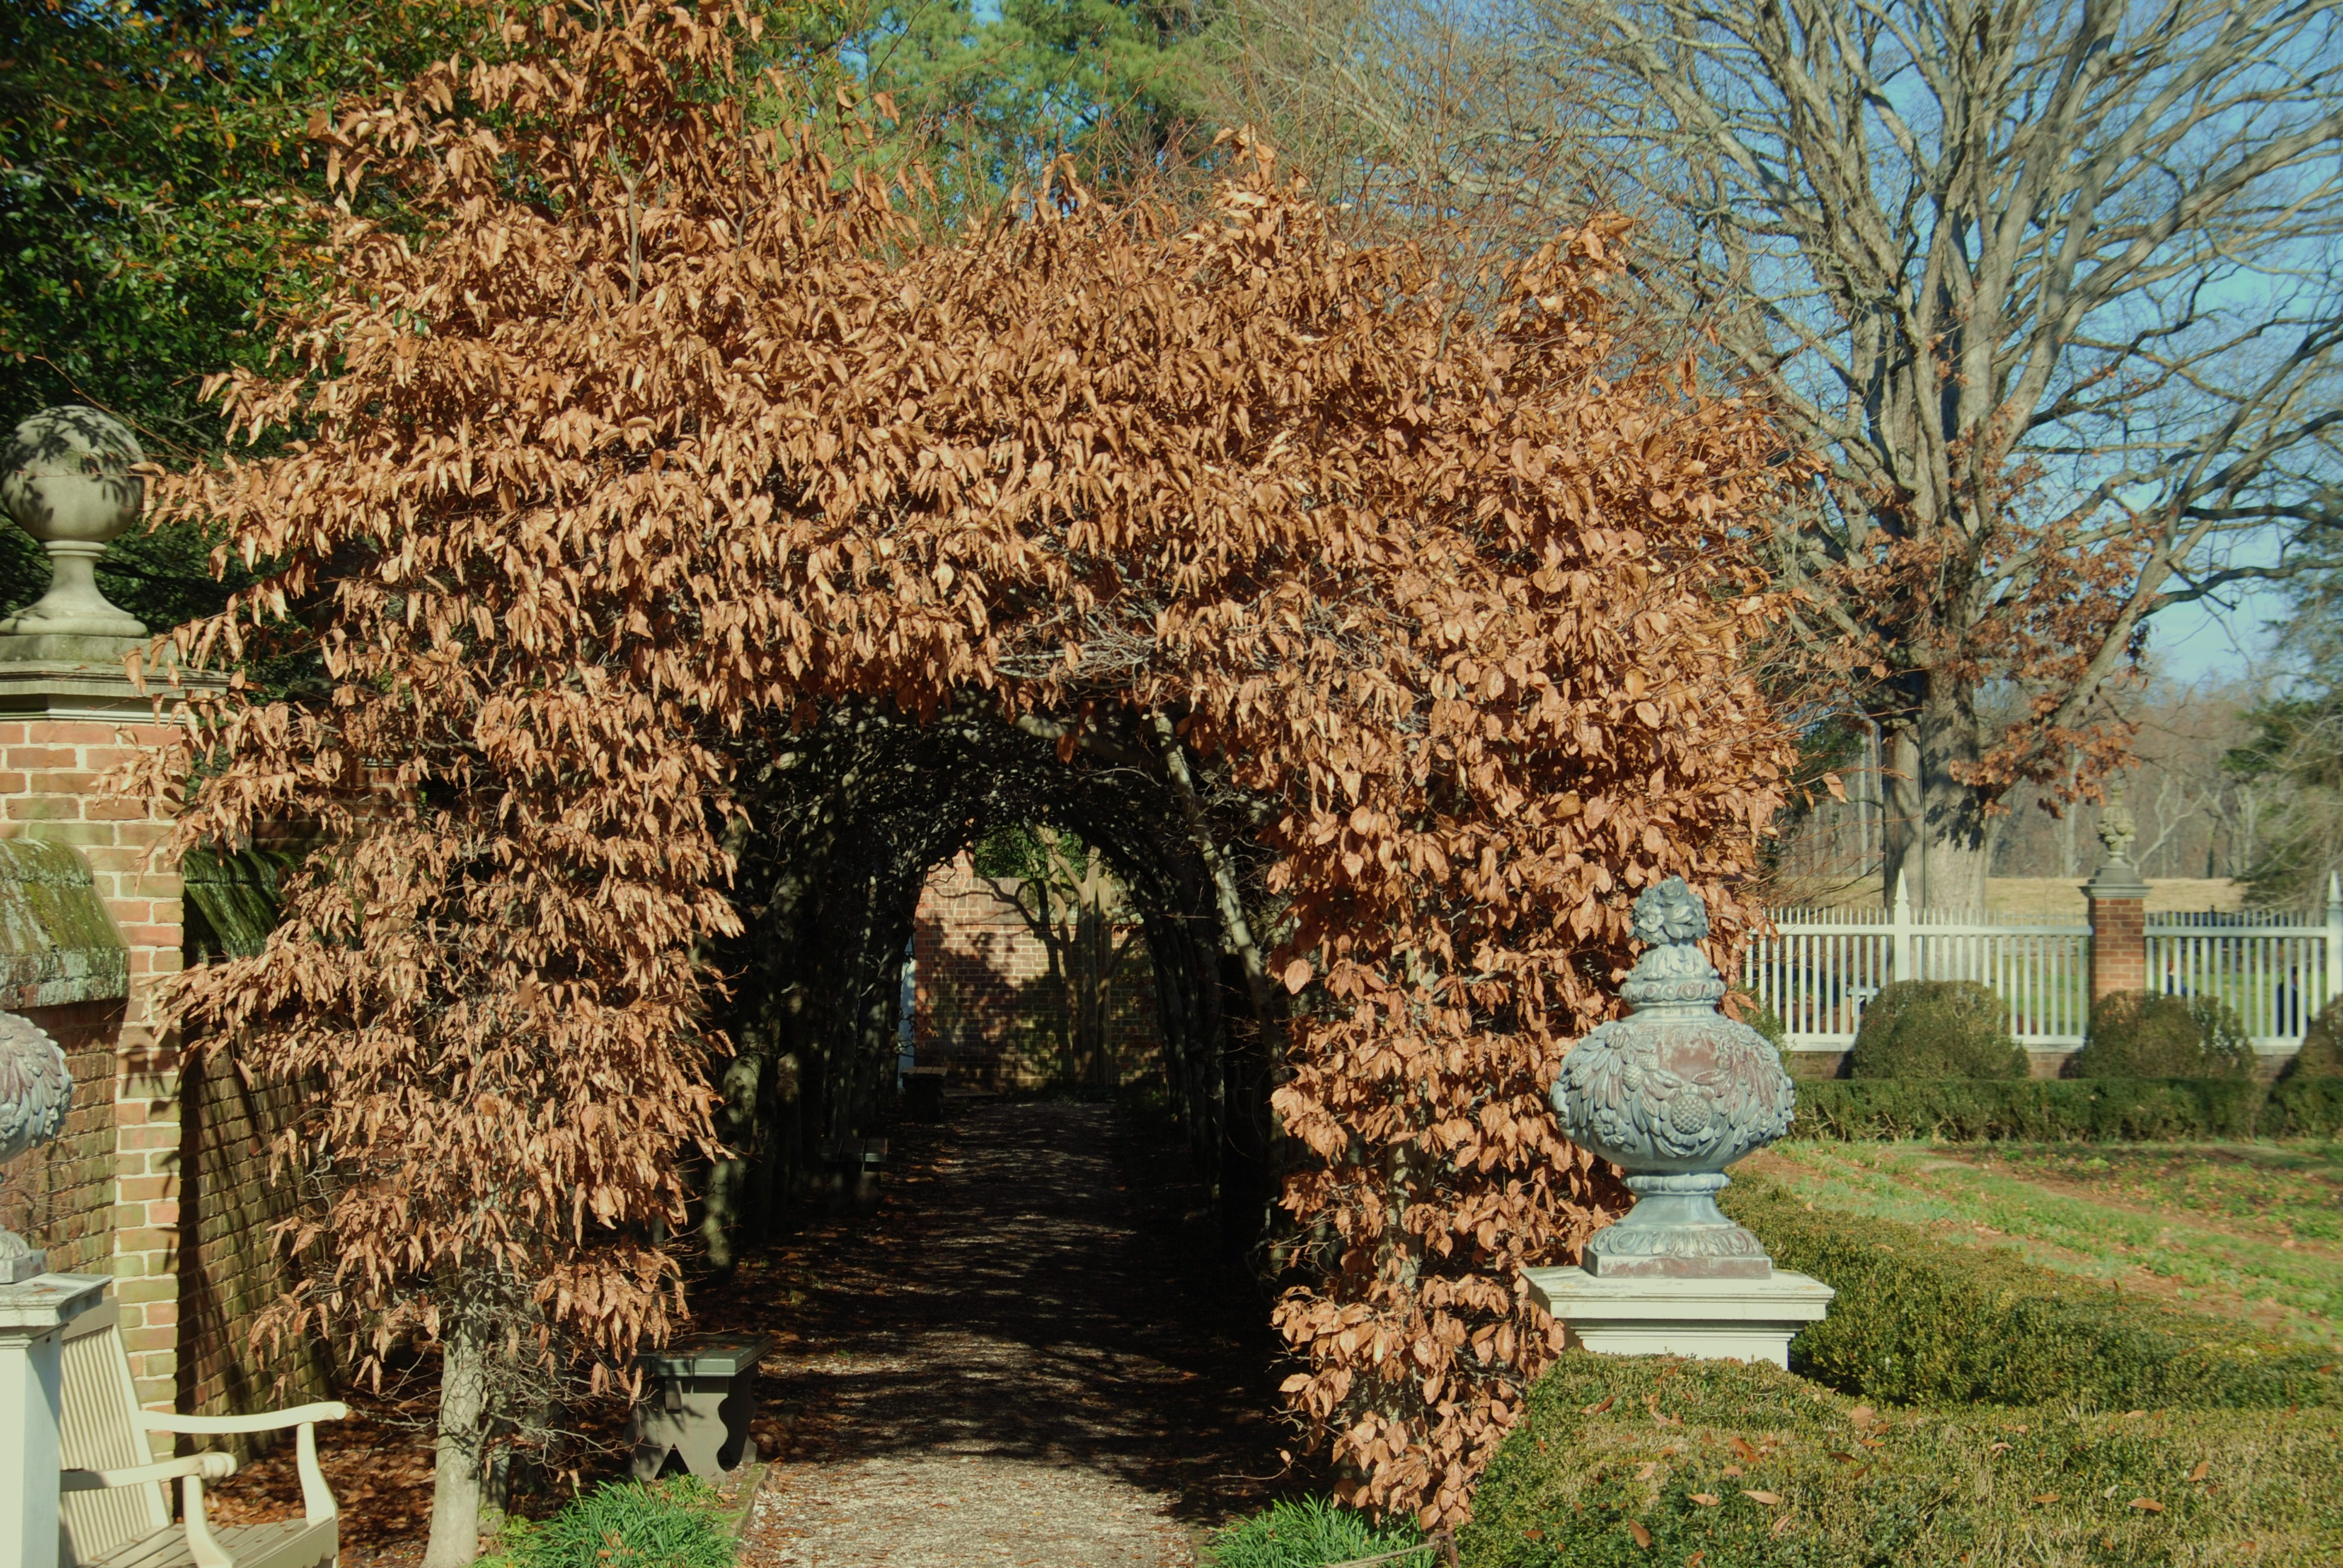 colonial williamsburg explore humbertomorenos photos on